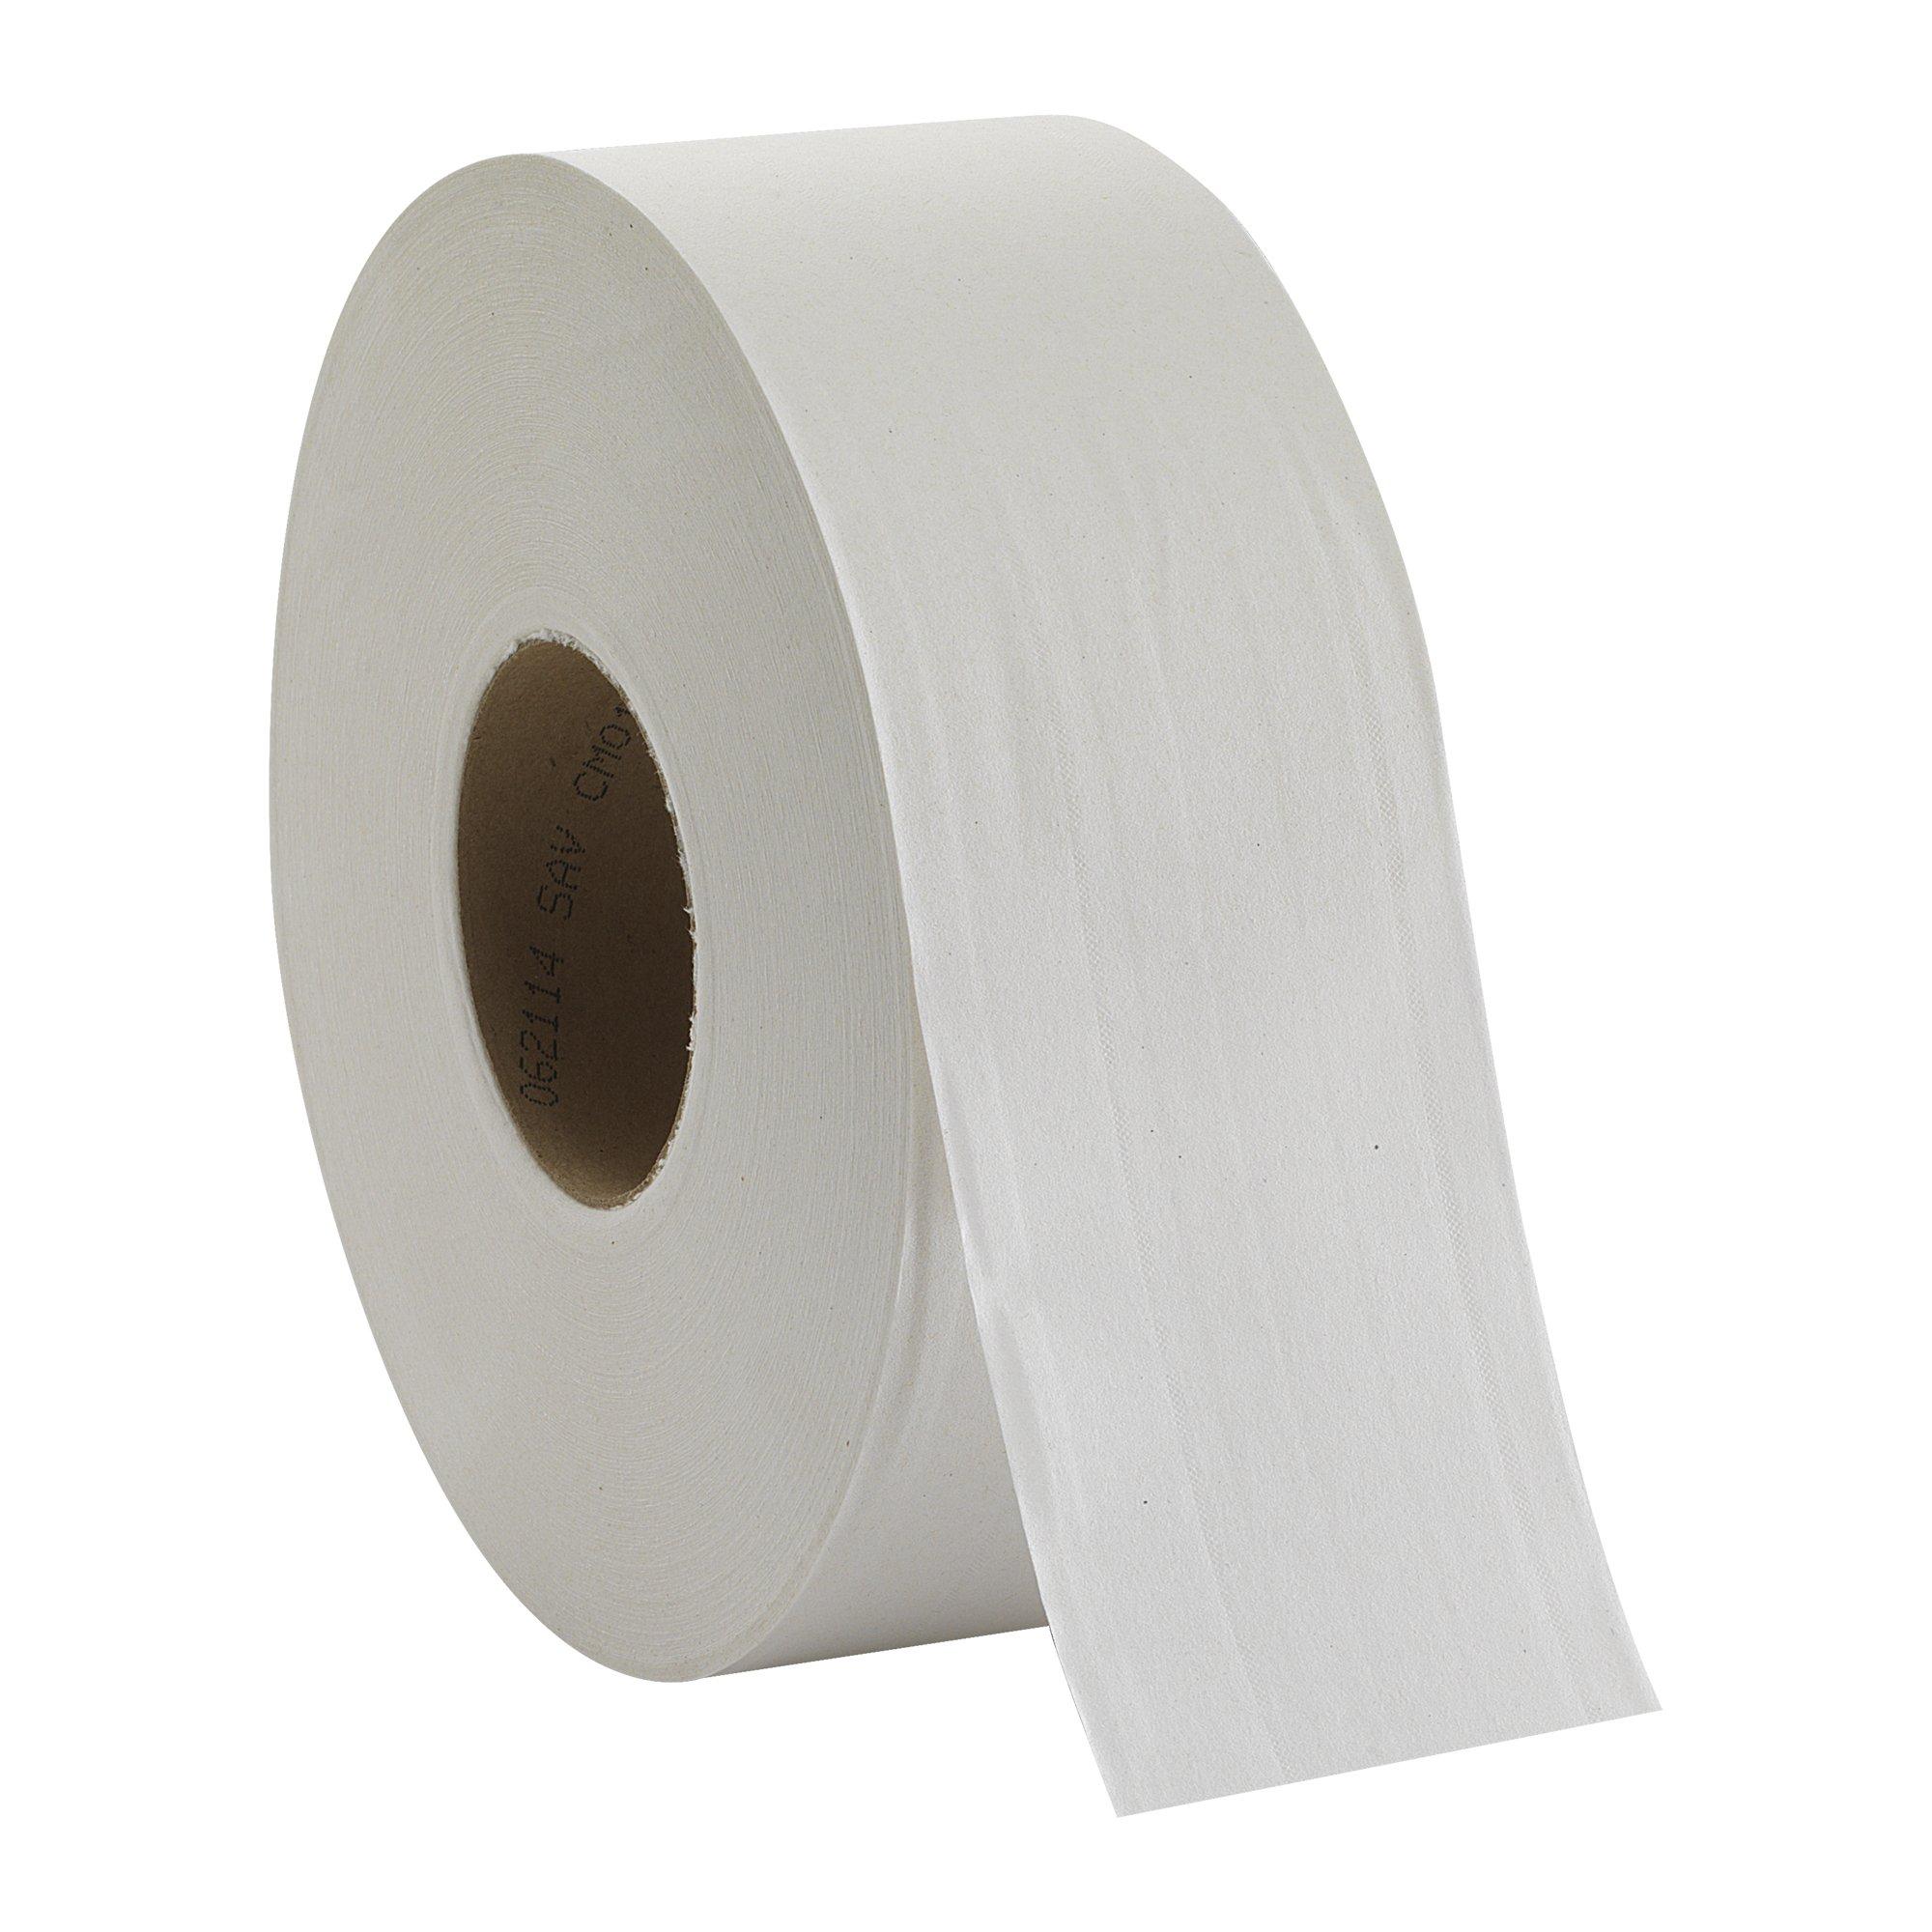 Georgia Pacific Professional 12798 Jumbo Jr. Bathroom Tissue Roll, 9'' dia, 1000ft (Case of 8 Rolls)